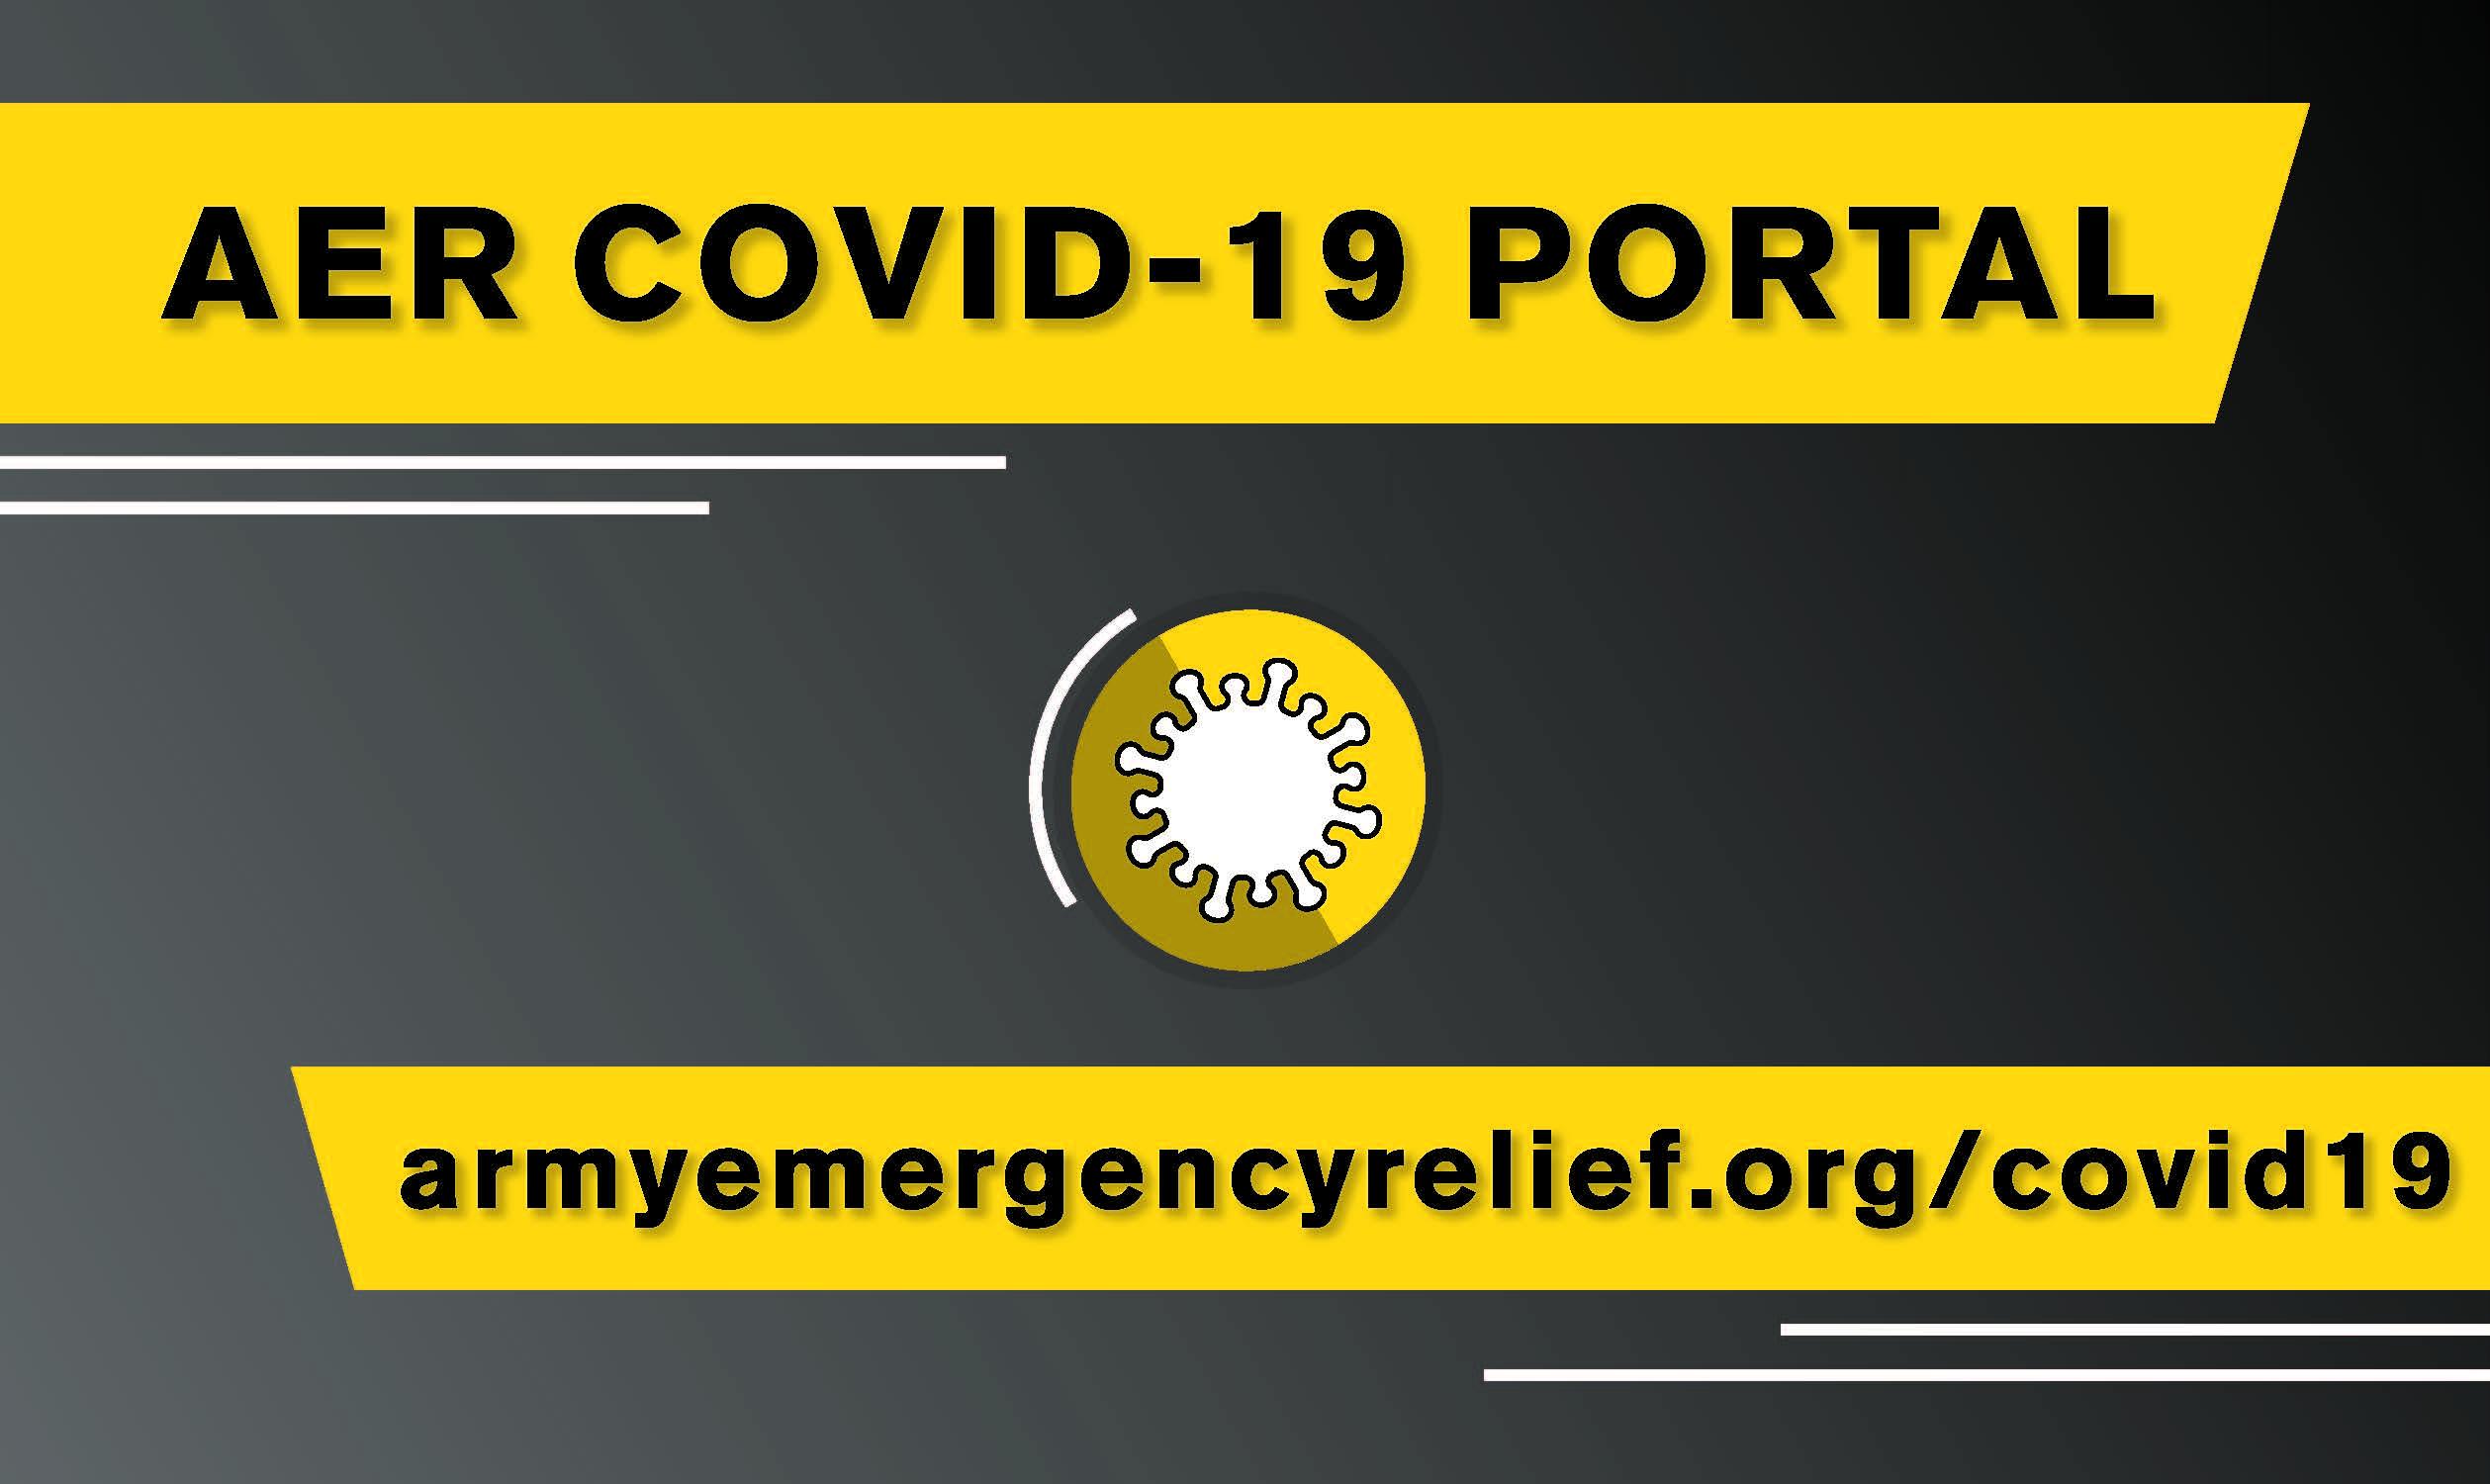 AER COVID-19 Portal